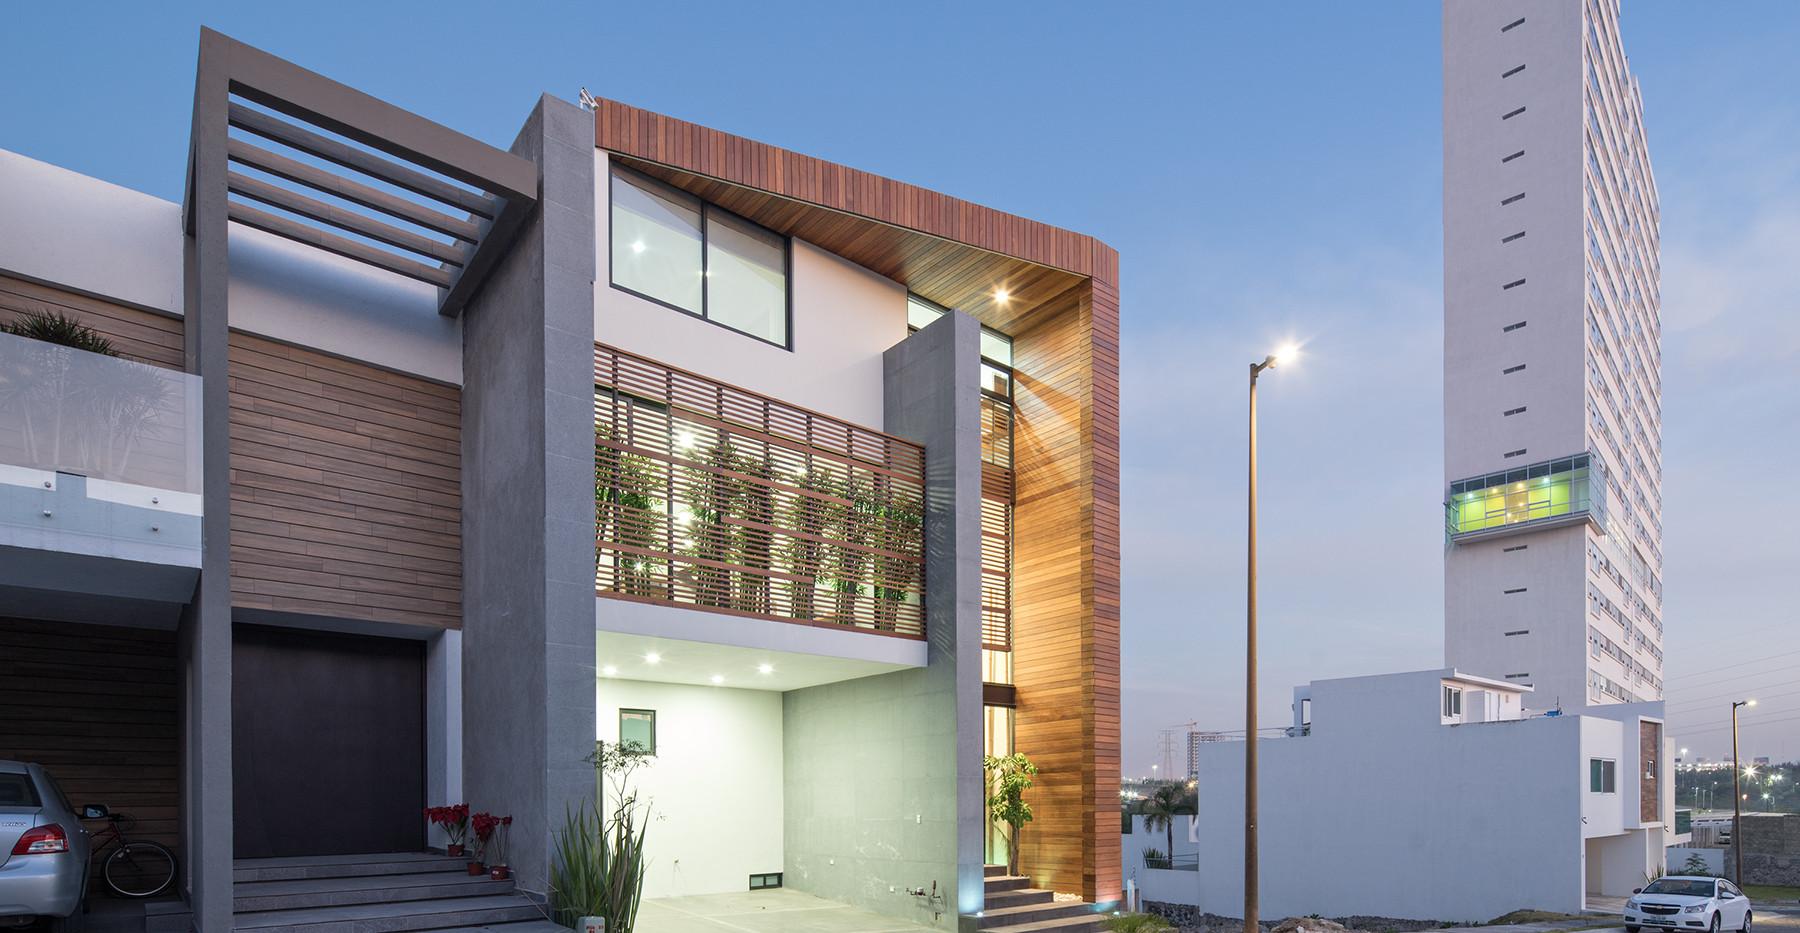 CIMA house / Grupo COPLA Puebla, Mx